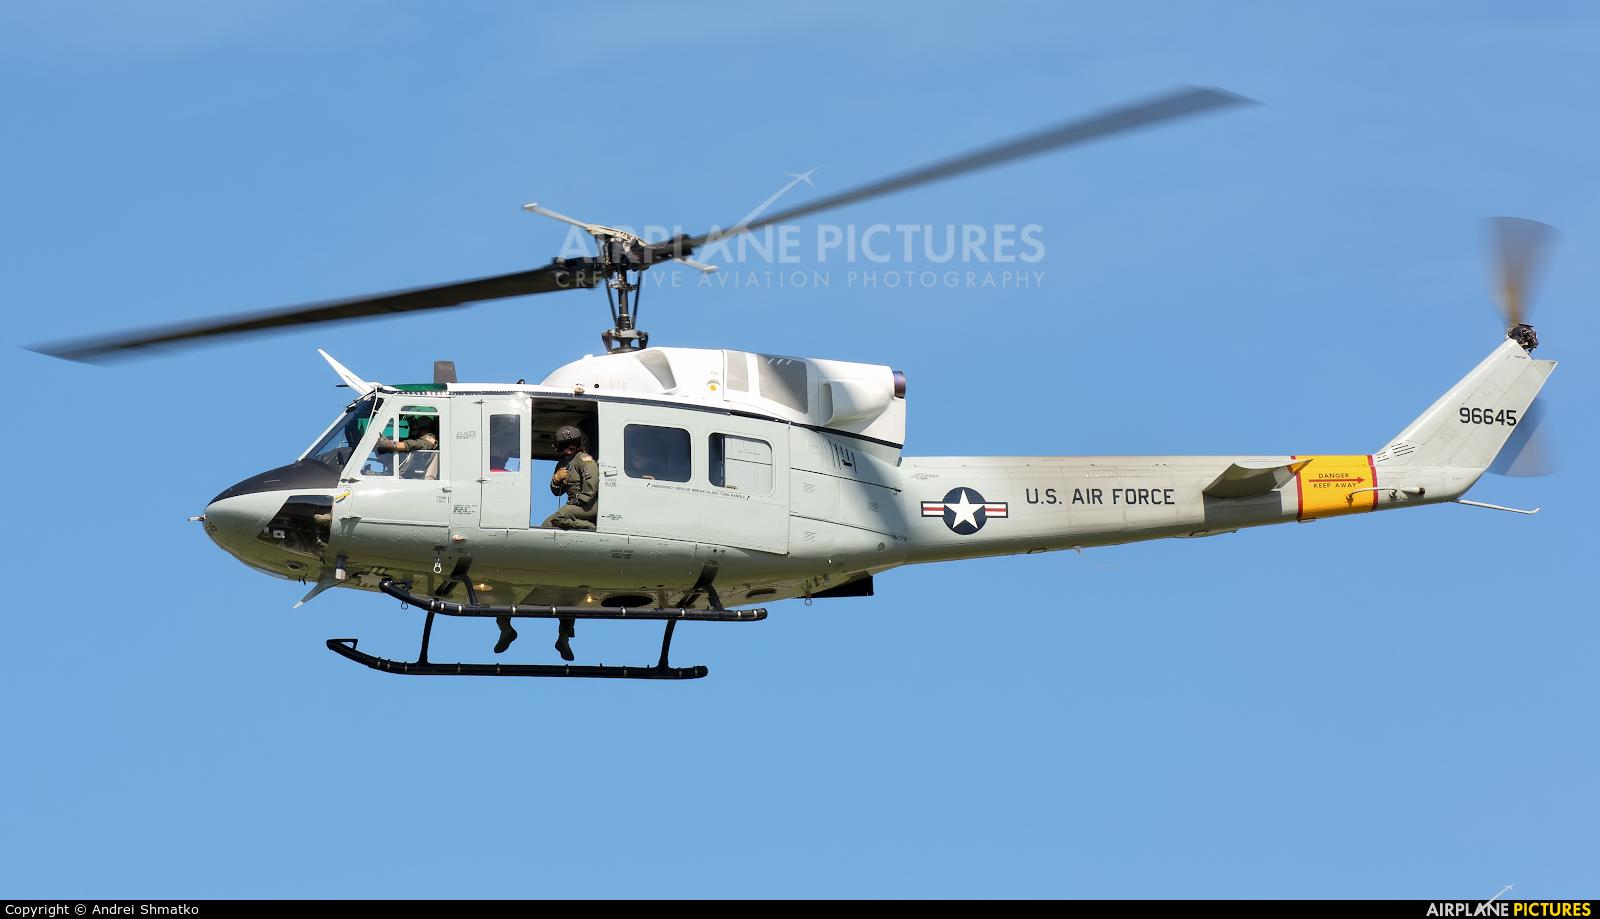 USA - Air Force 69-6645 aircraft at Yokota AB